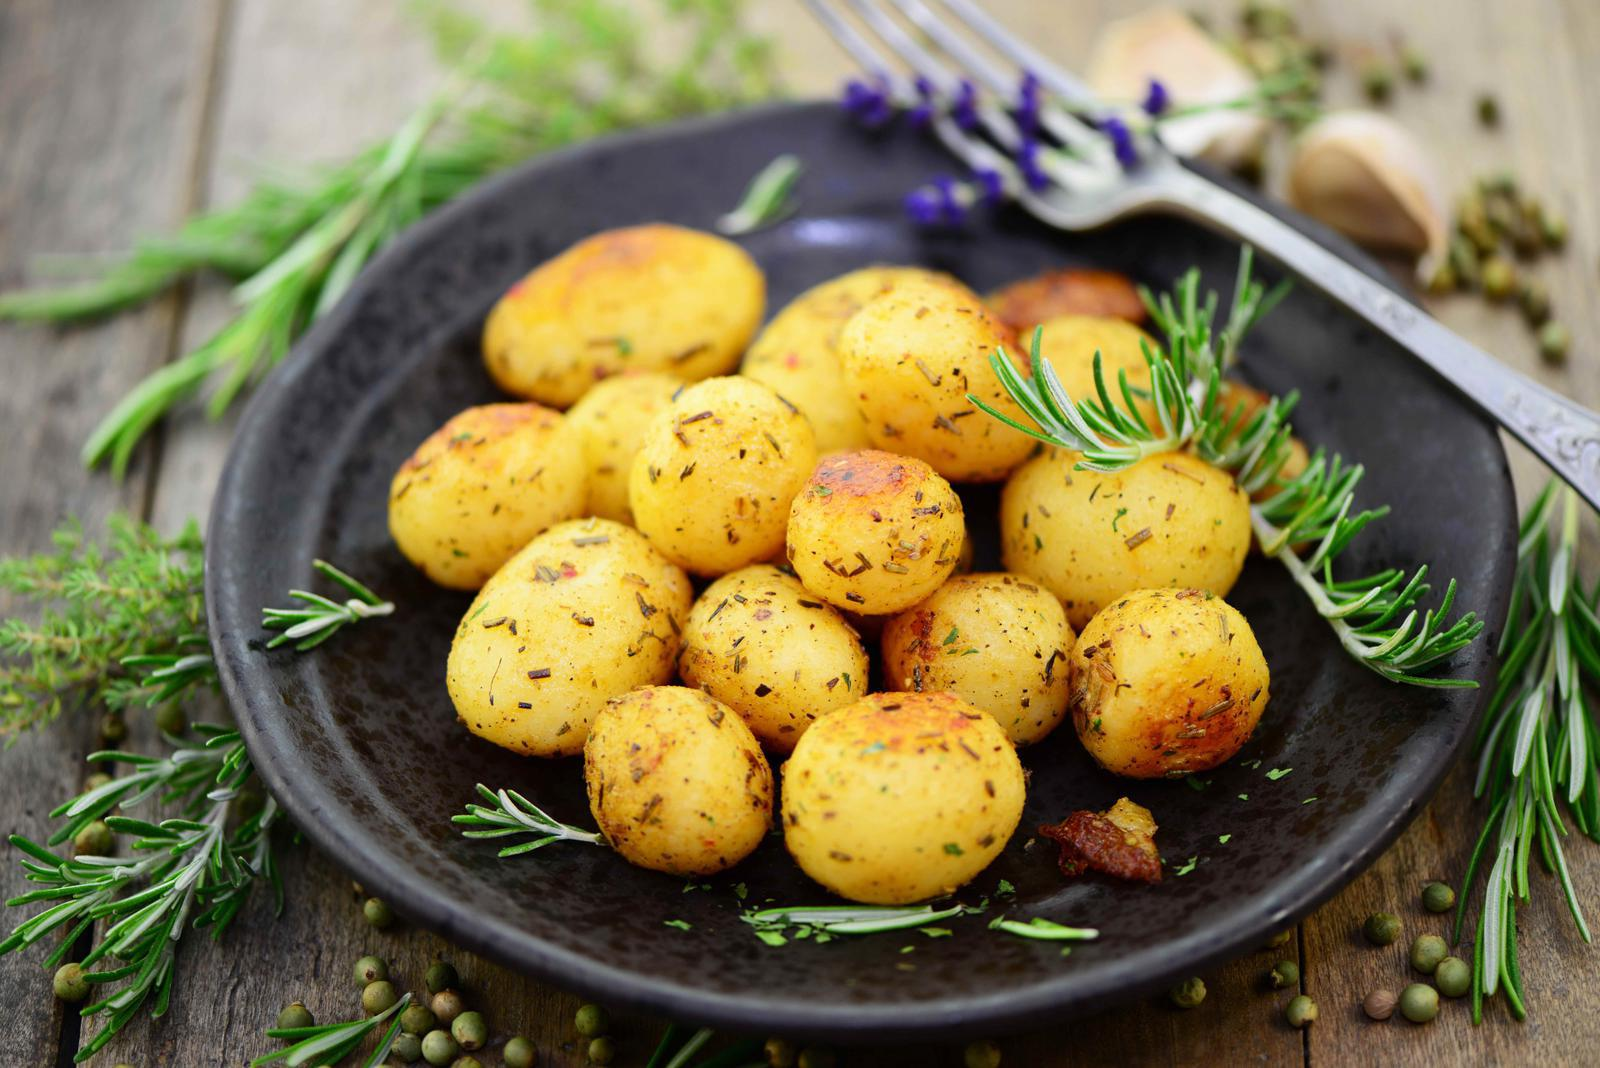 aardappels bakken kruiden